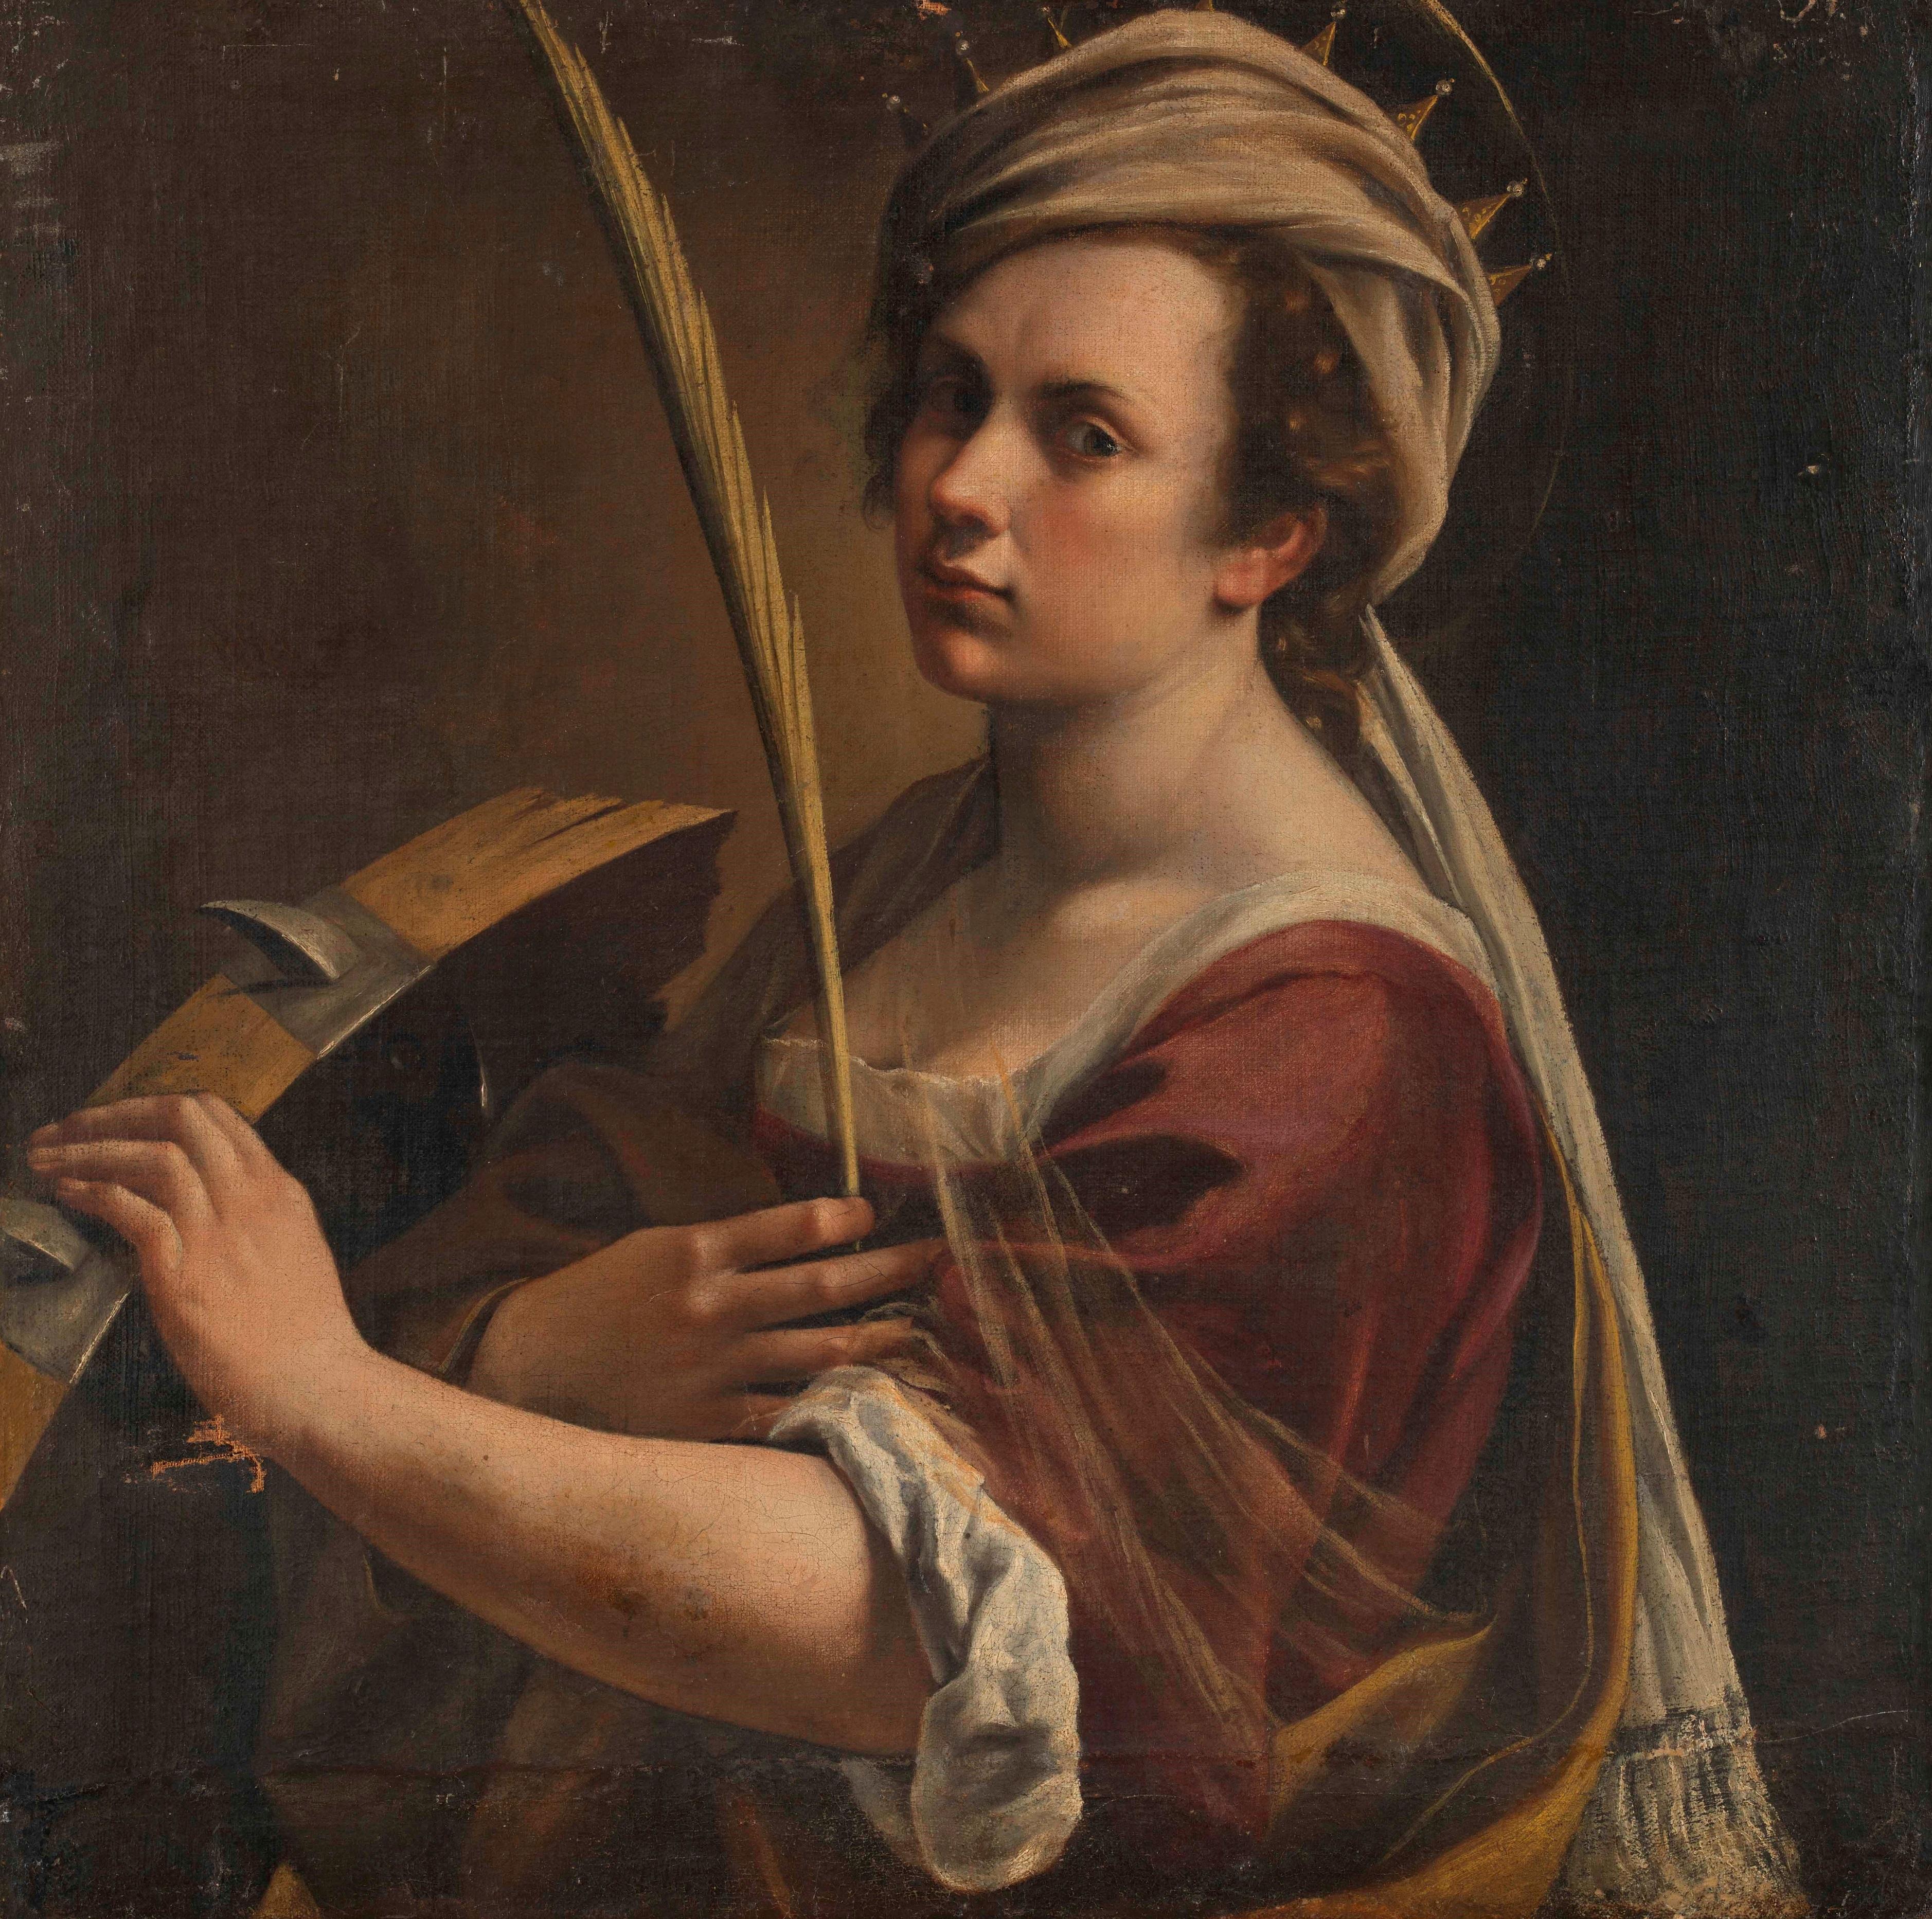 Artemisia Gentileschi önarcképe 1616-ból (forrás: Wikipedia)